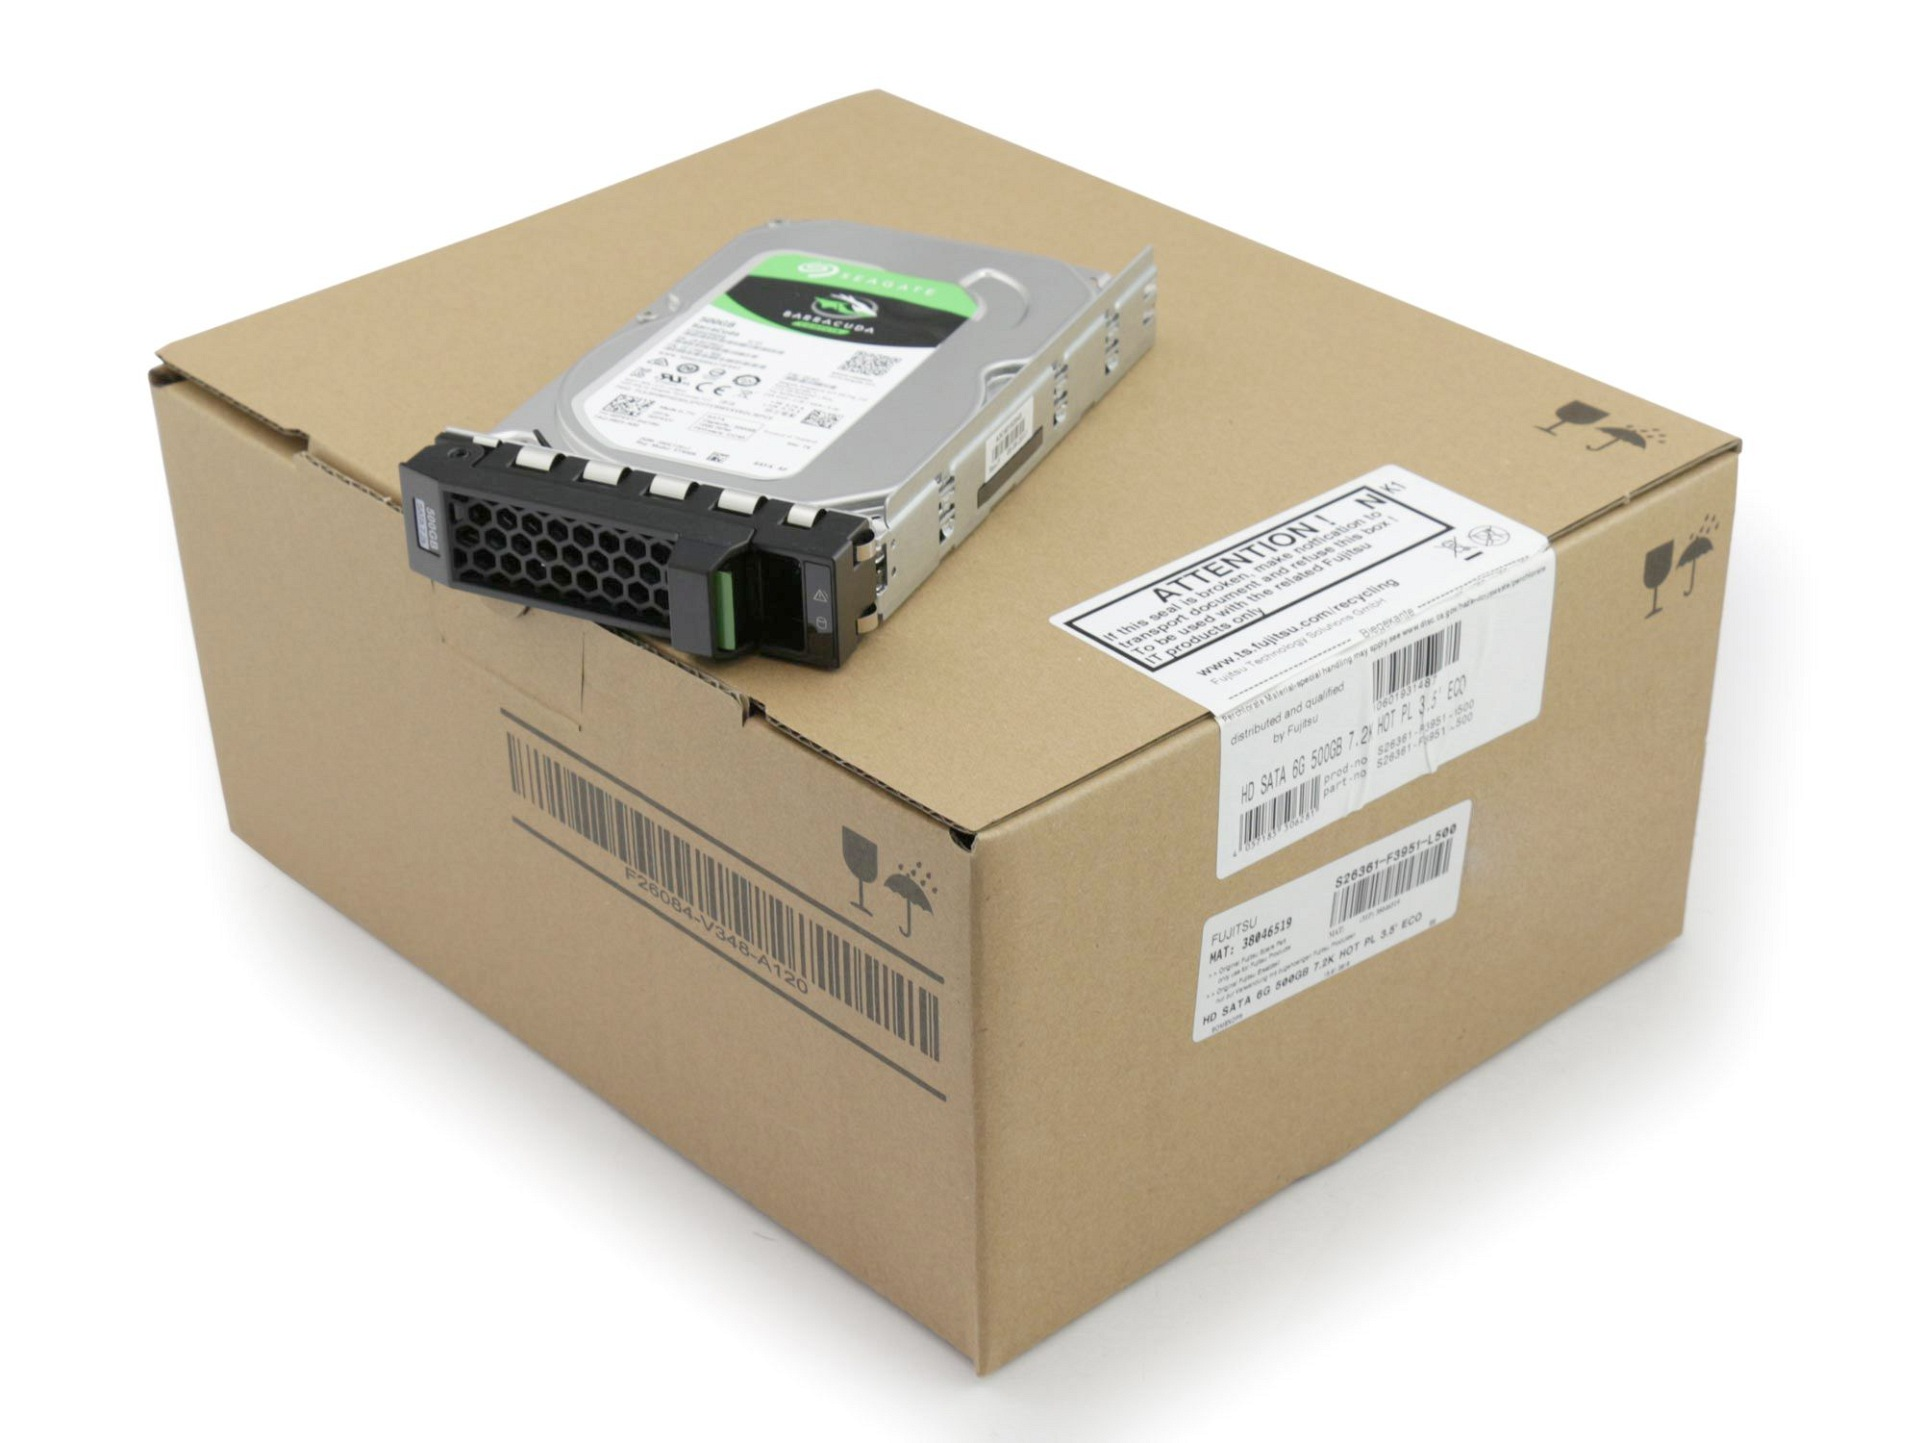 Fujitsu 10601931487 Server Festplatte HDD 500GB (3,5 Zoll / 8,9 cm) S-ATA III (6,0 Gb/s) ECO 7.2K inkl. Hot-Plug